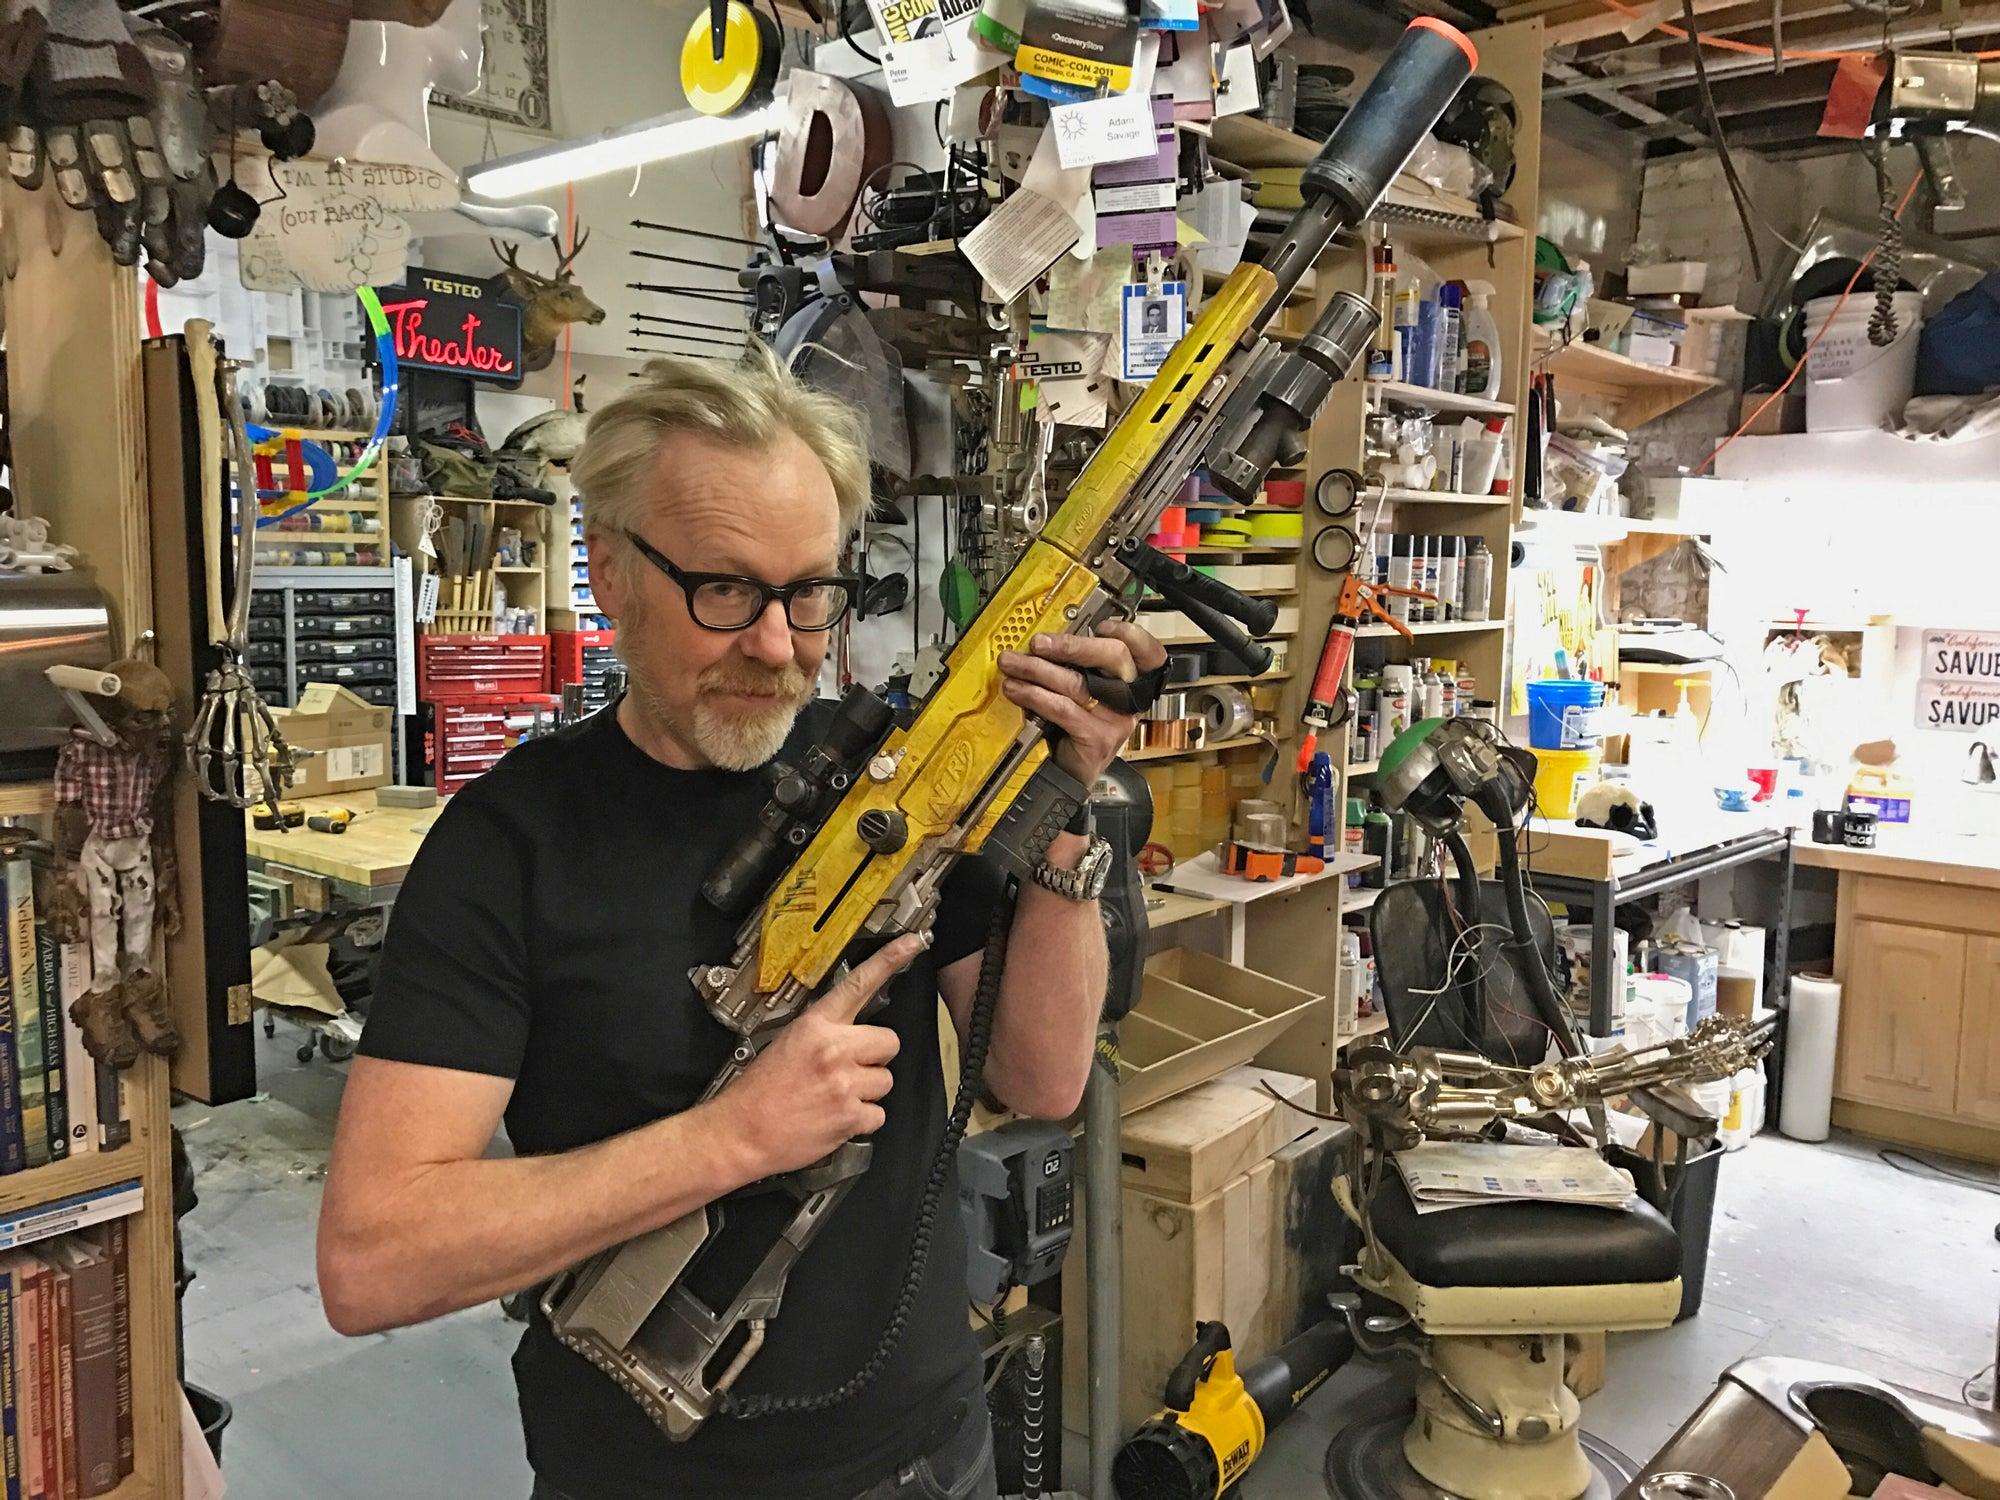 Watch Adam Savage Give A Nerf Blaster An Impressive Sci-Fi Movie Prop Makeover